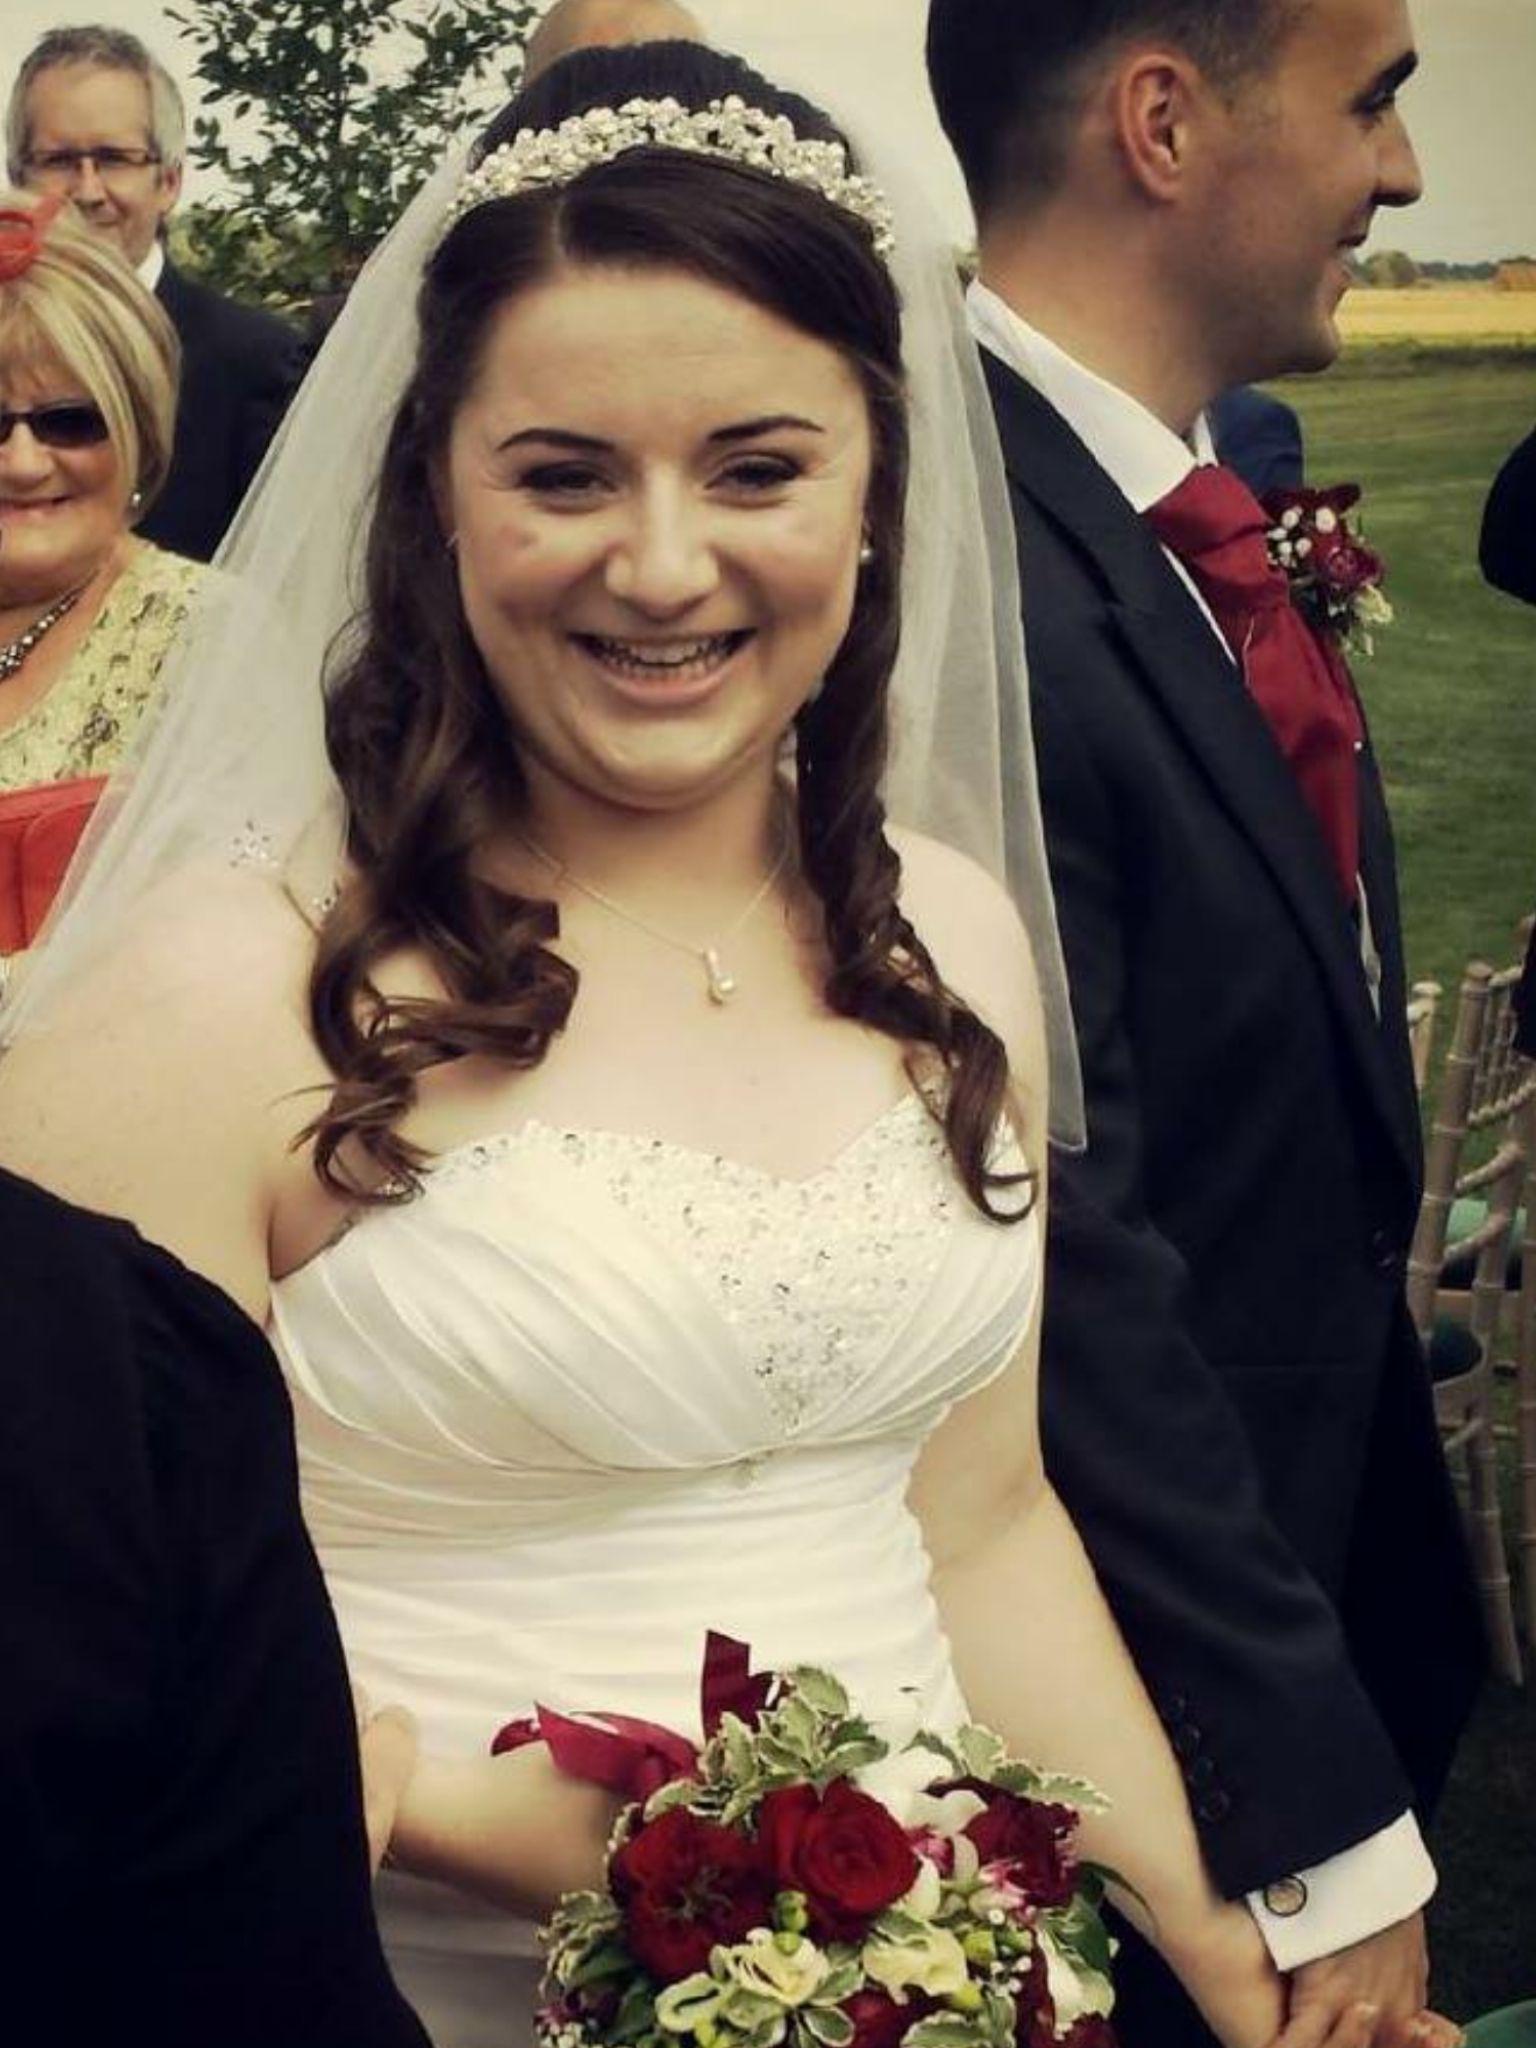 half up half down wedding hair -- she has no bangs to speak